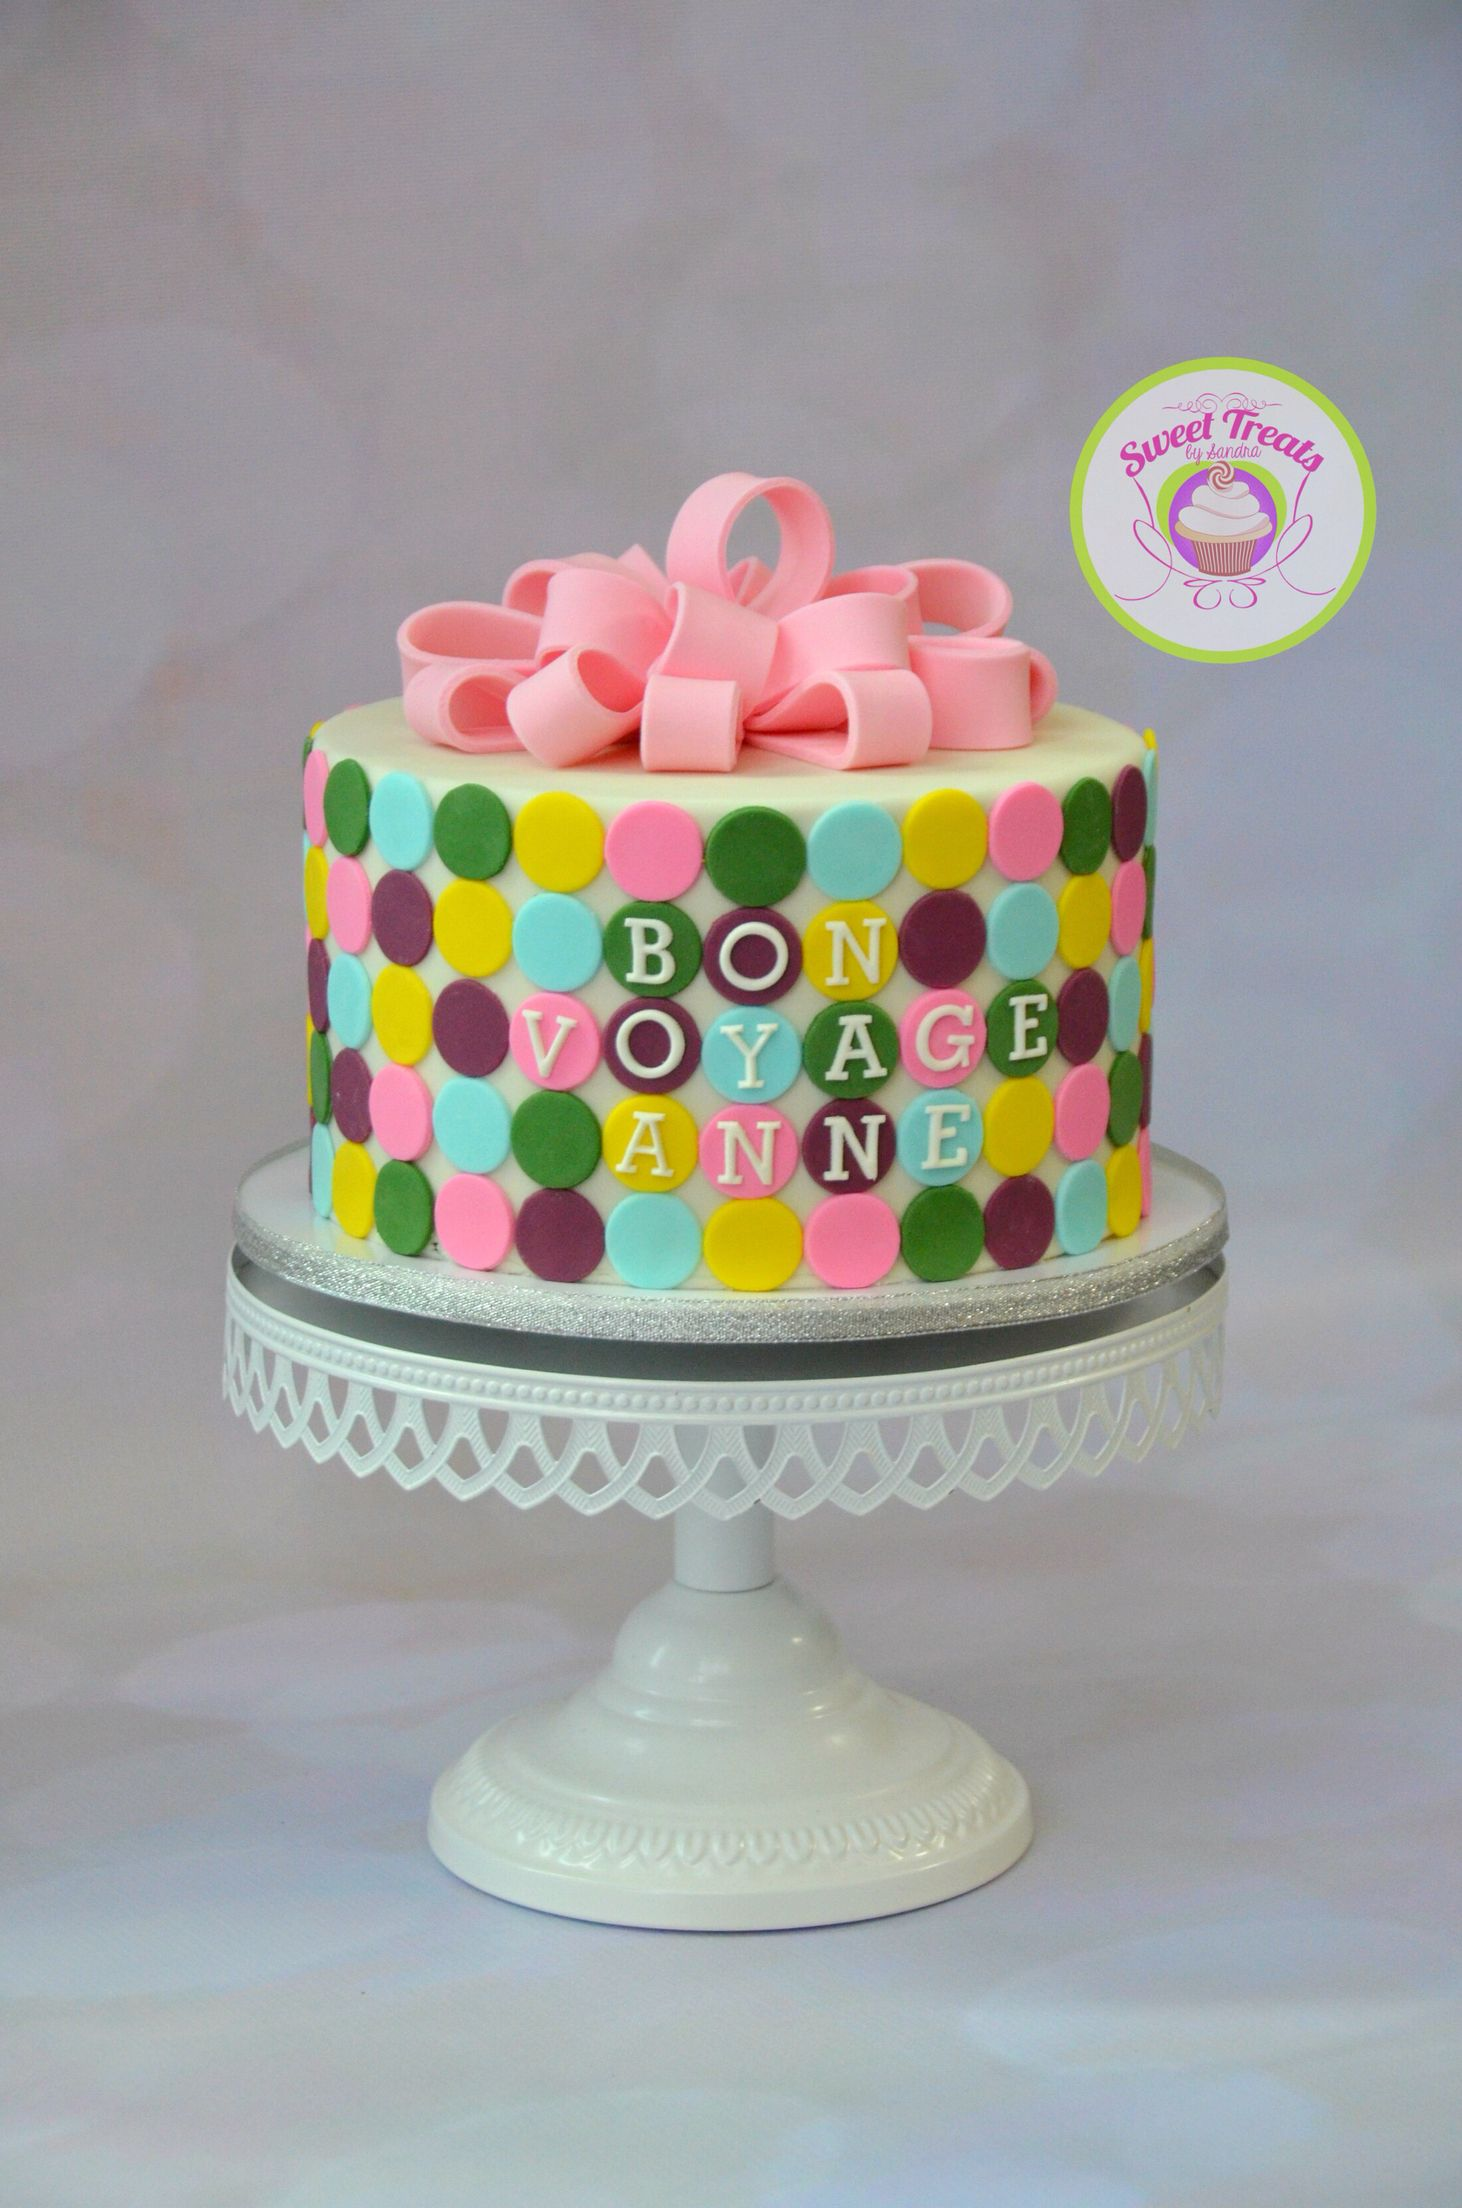 Bon Voyage Cake Bon Voyage Cake Ideas Cake Cake